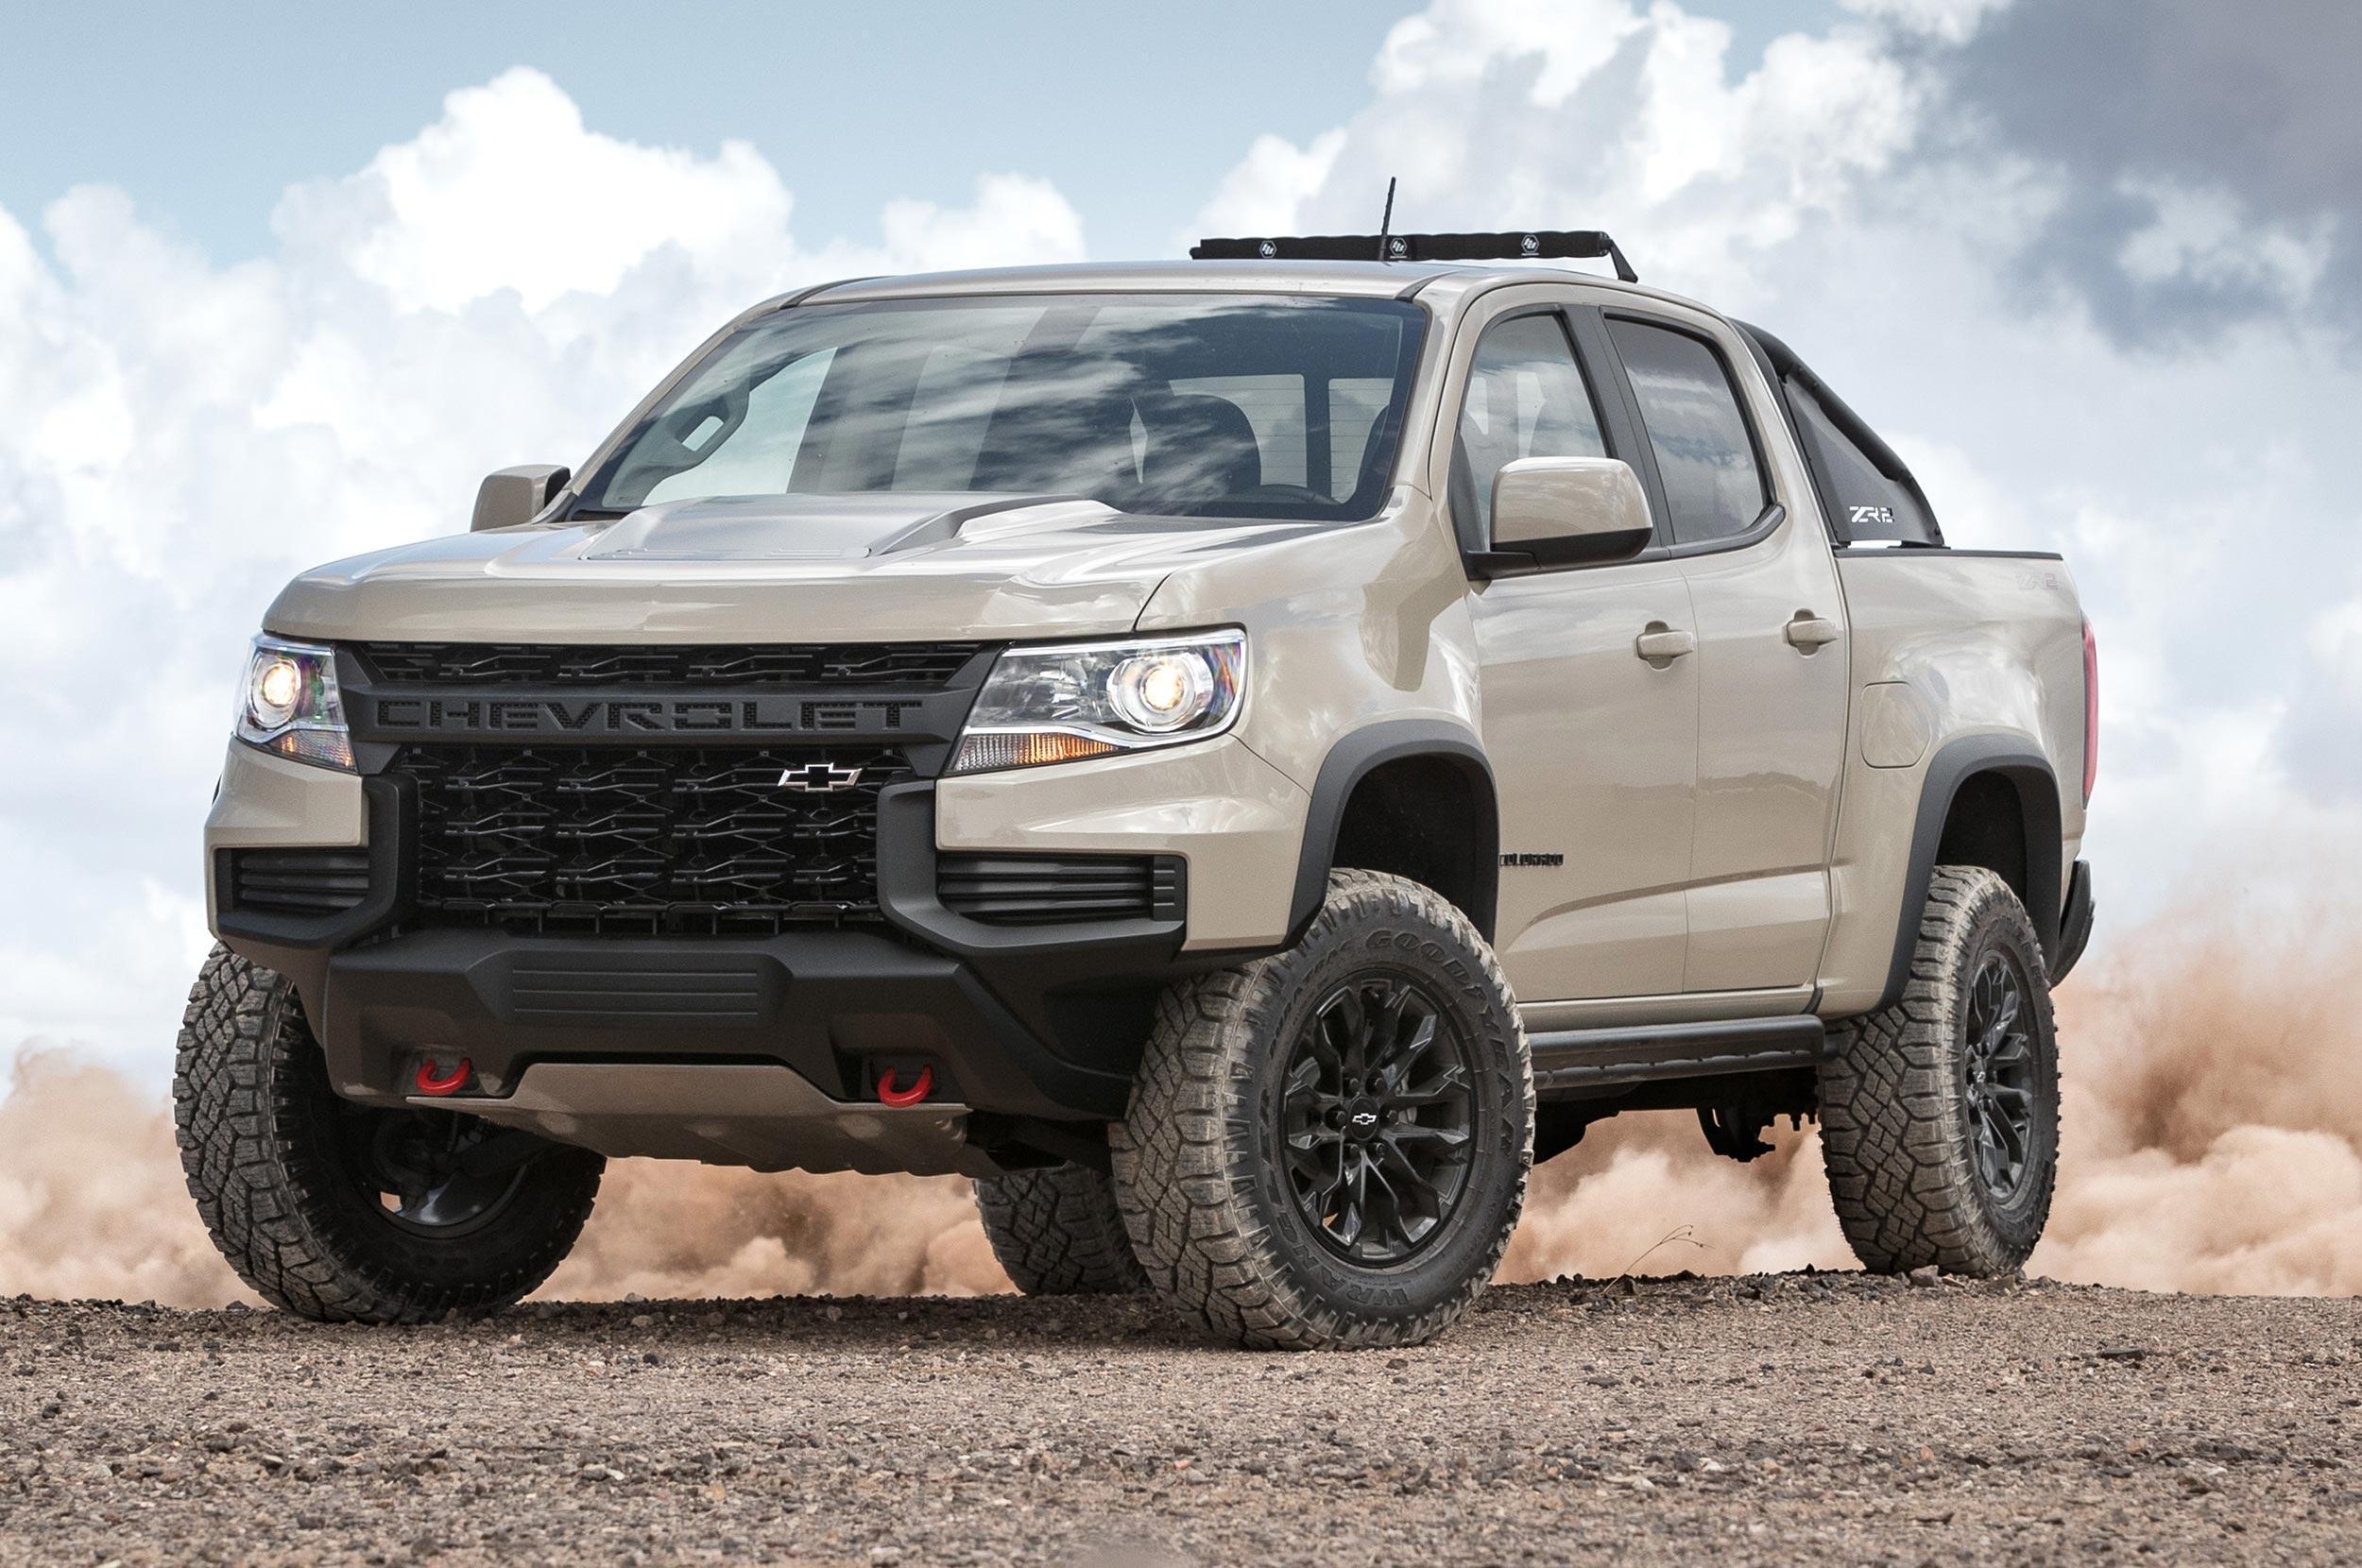 2021 Chevrolet Colorado Specs and Features - MSN Autos